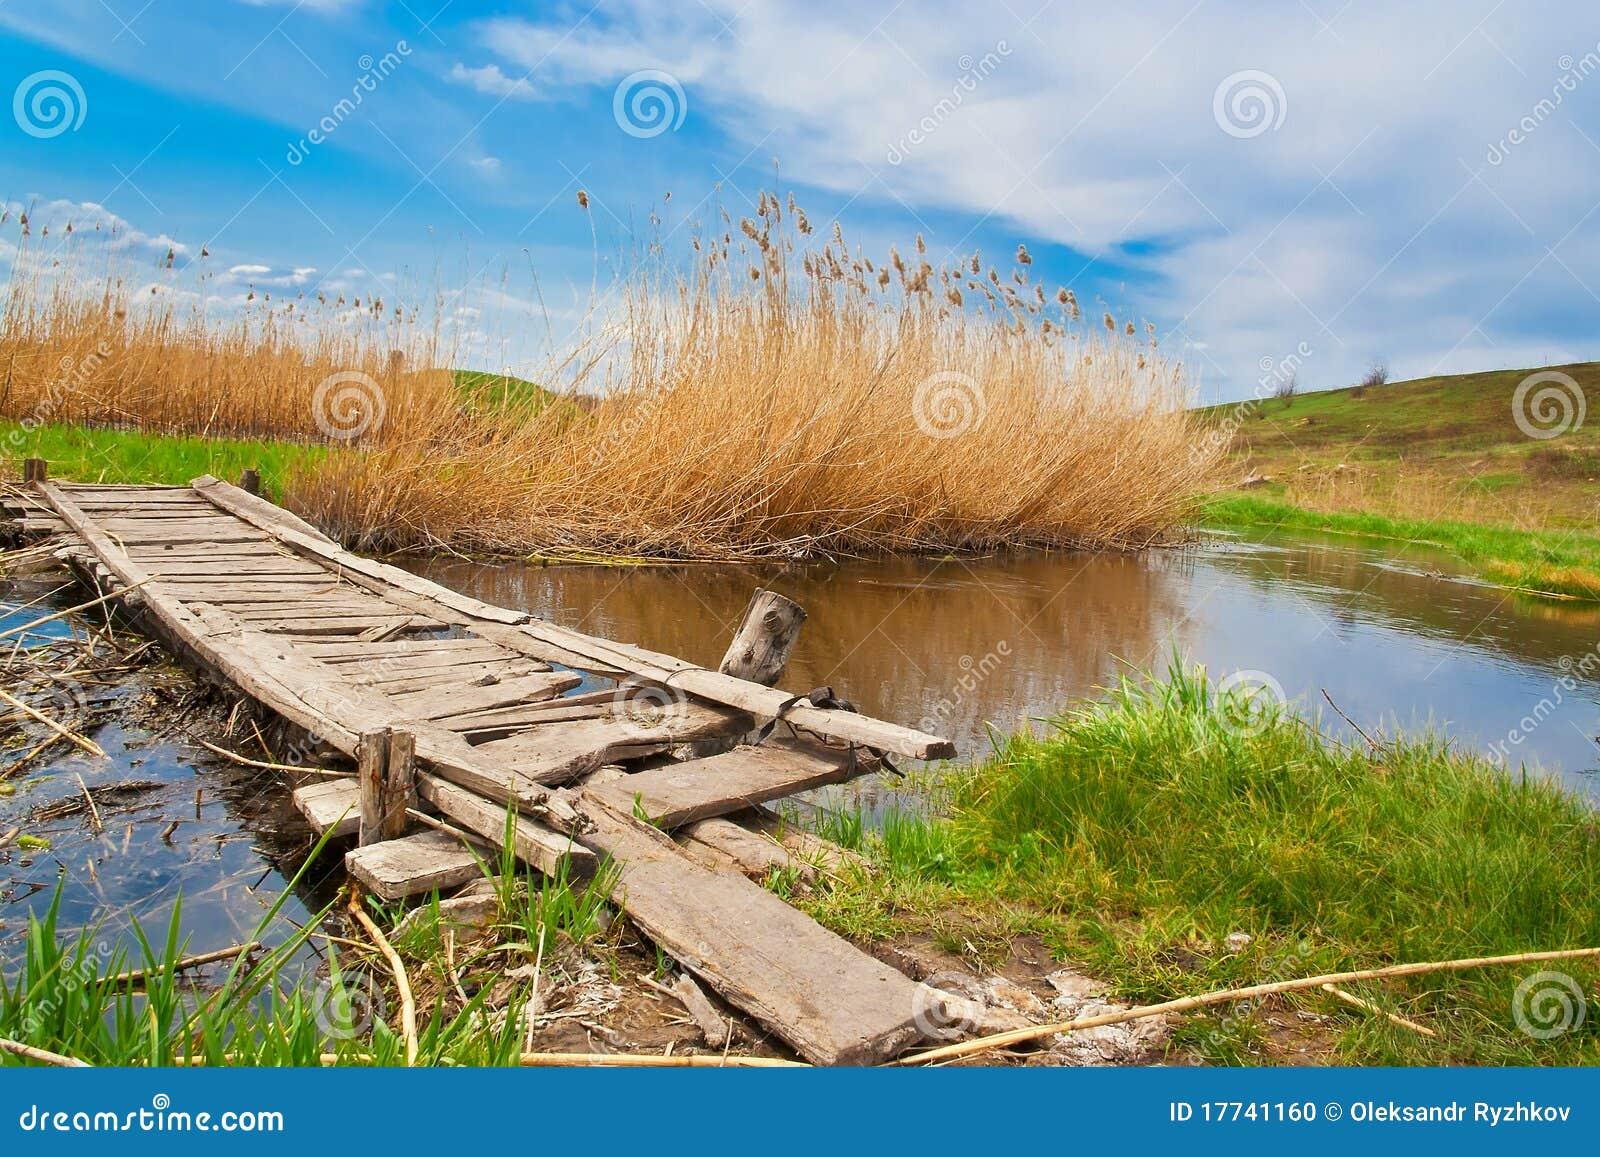 Small creek bridge plans